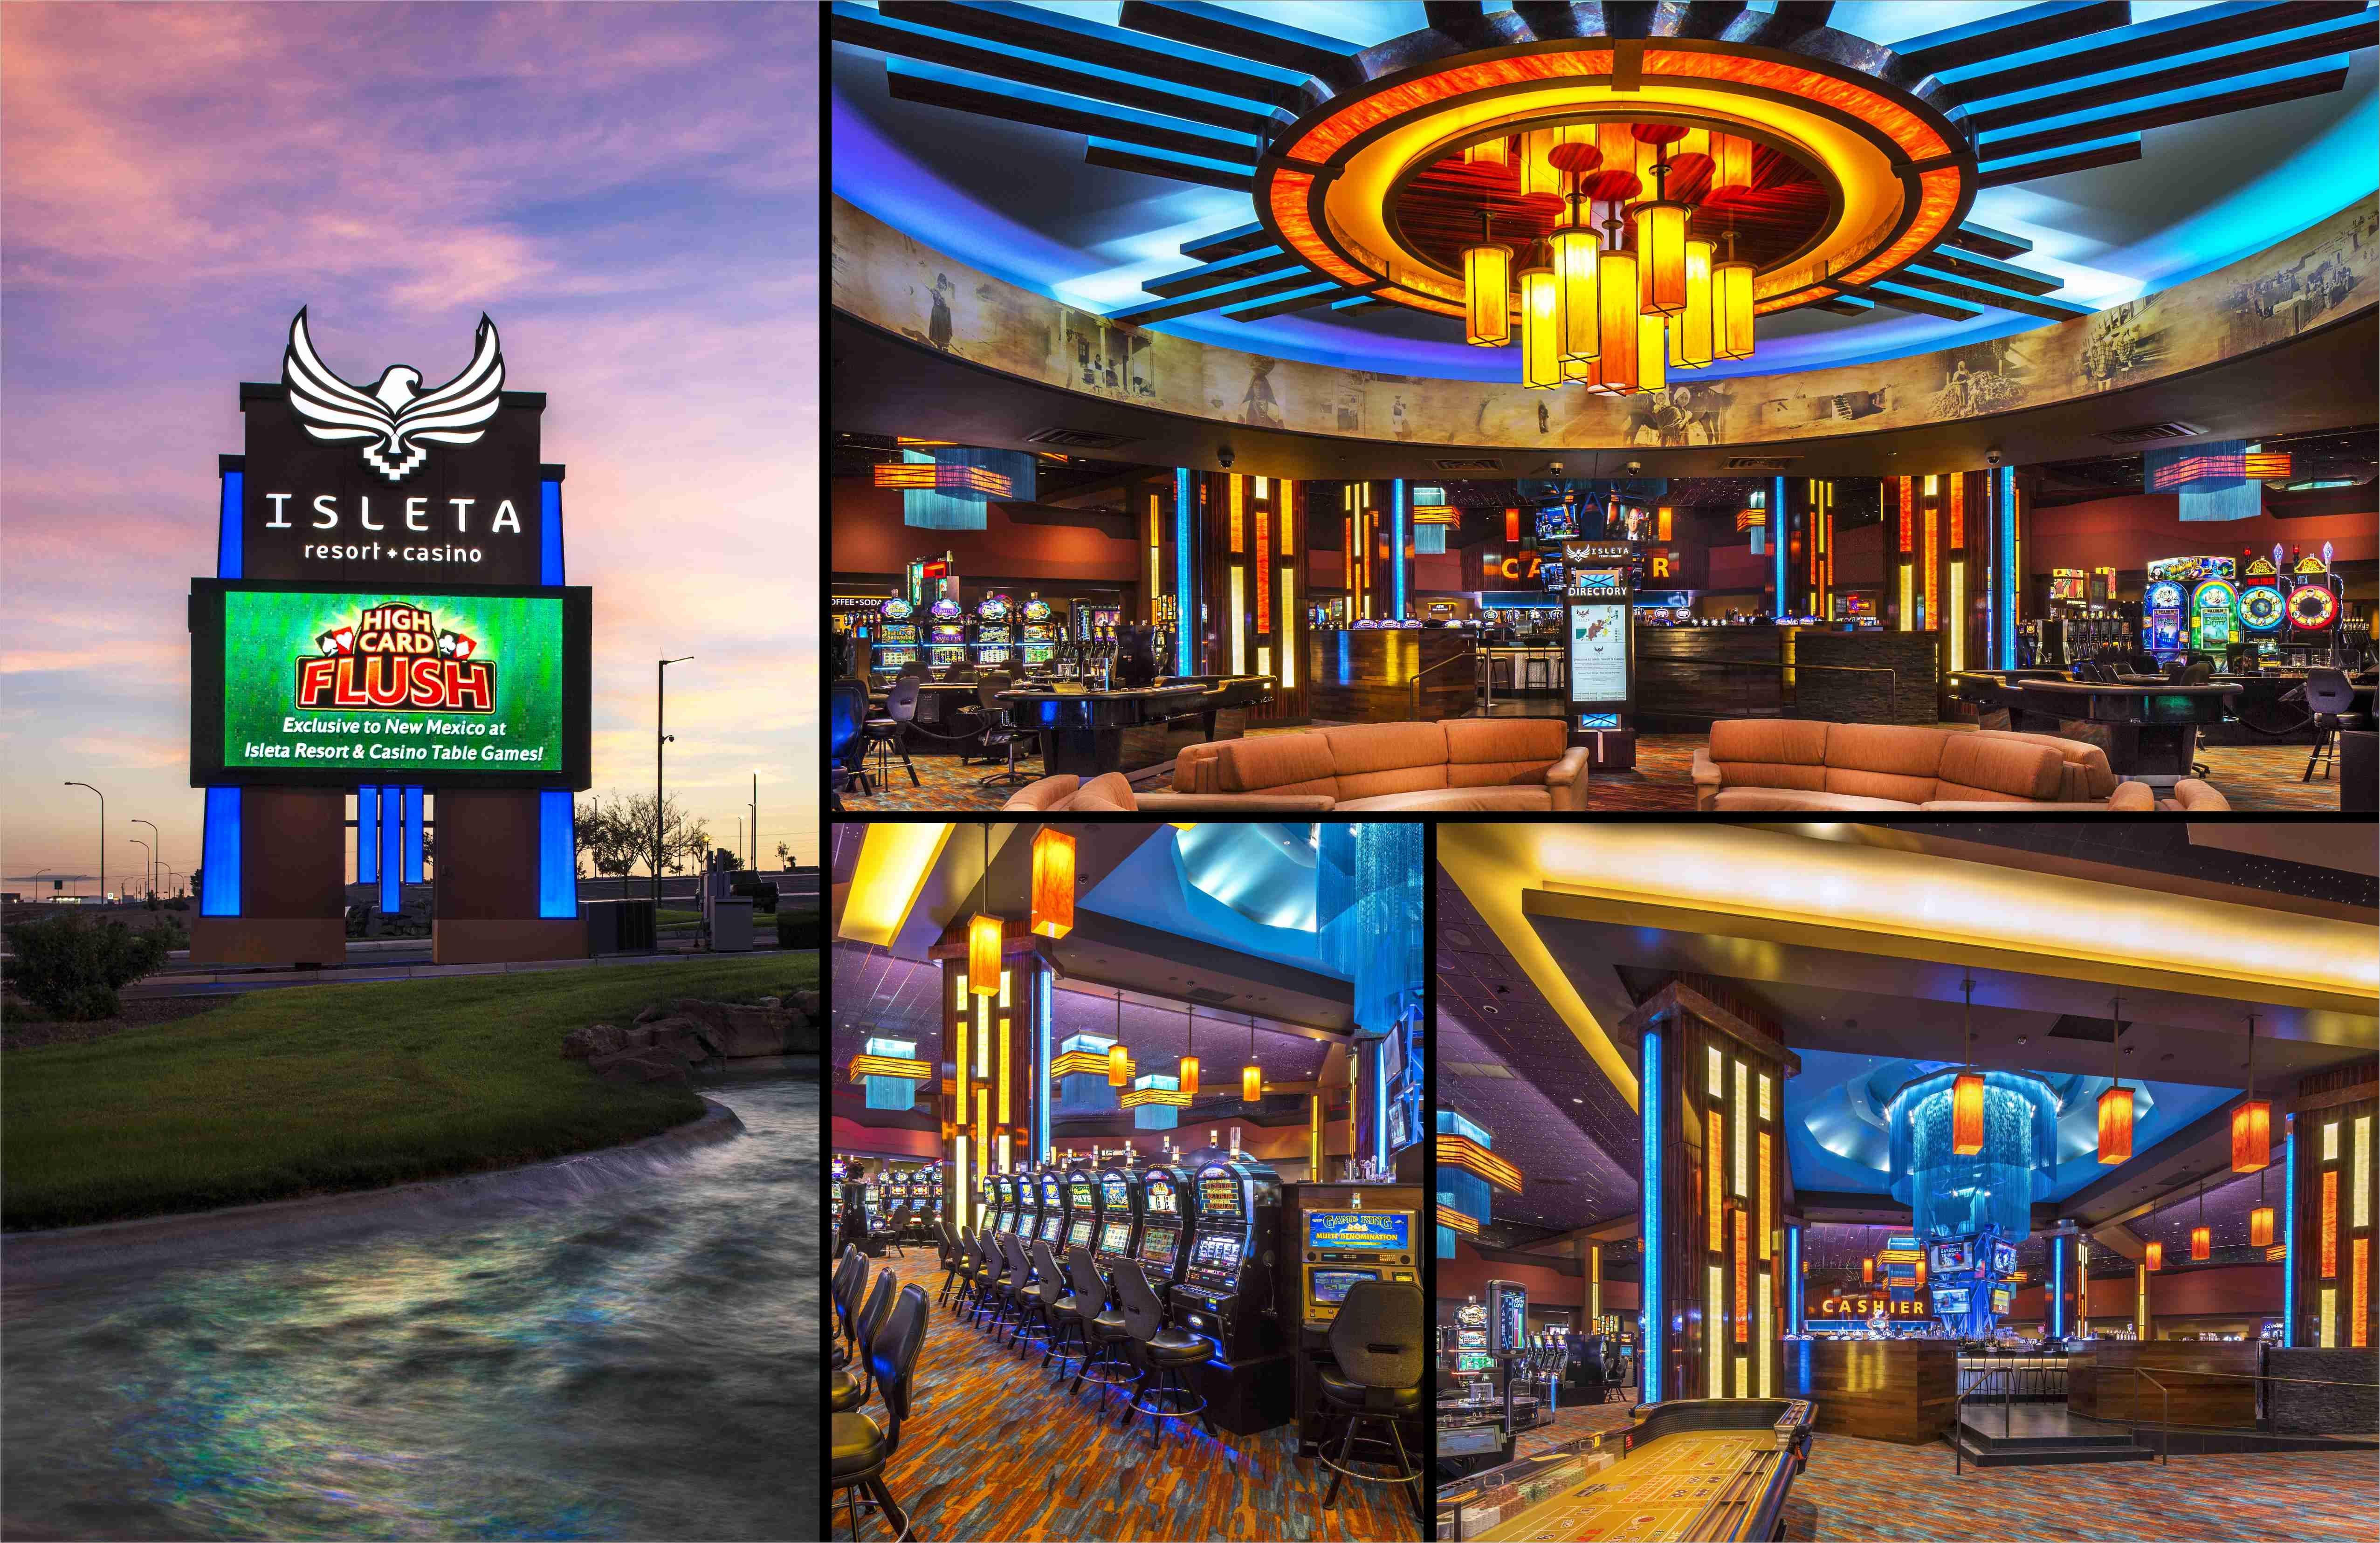 Isleta Casino Design And Renovation